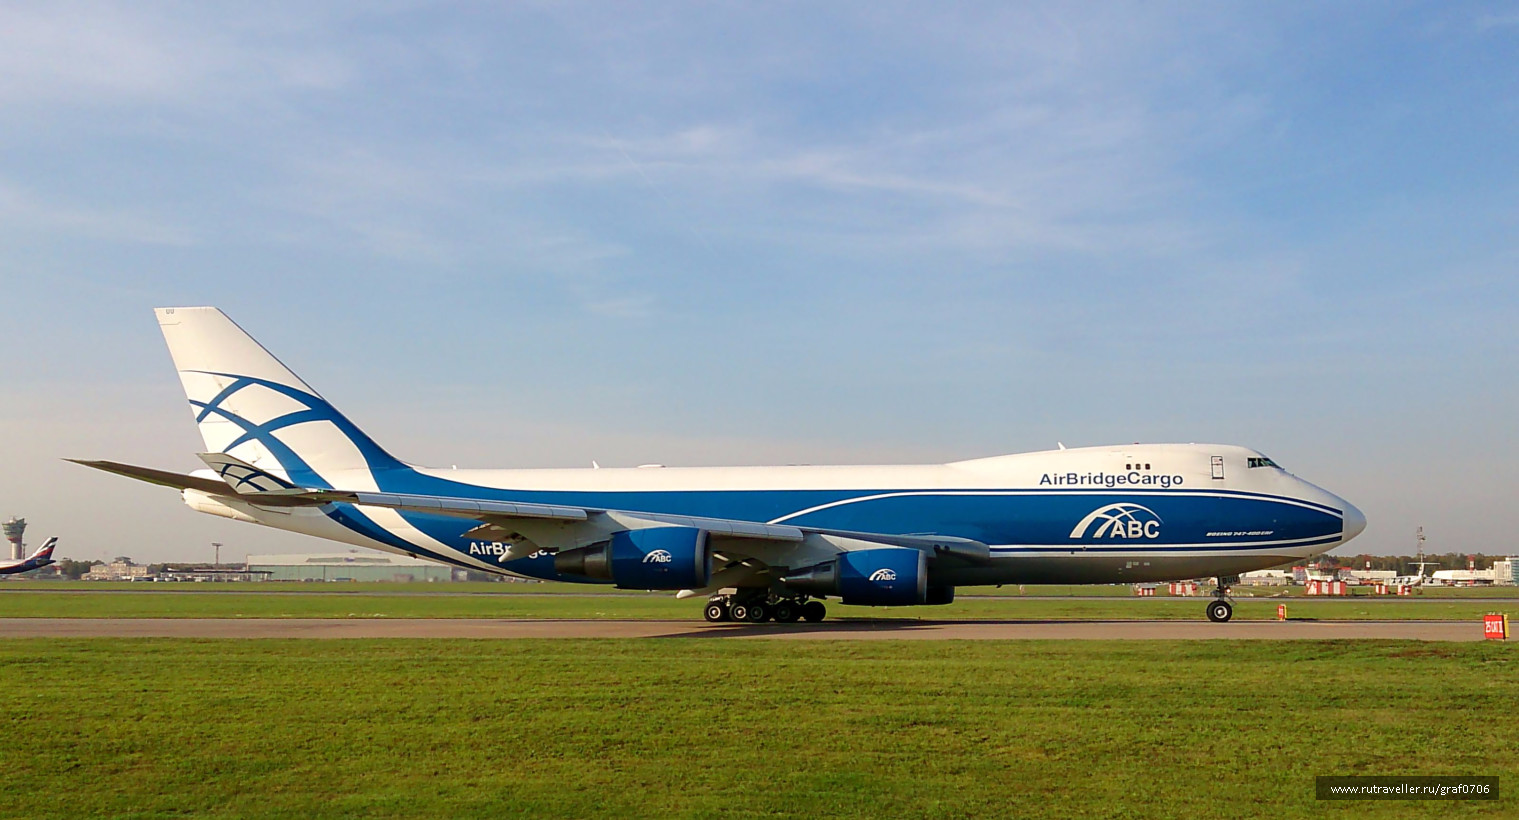 SVO ABC B-747-400 (3)